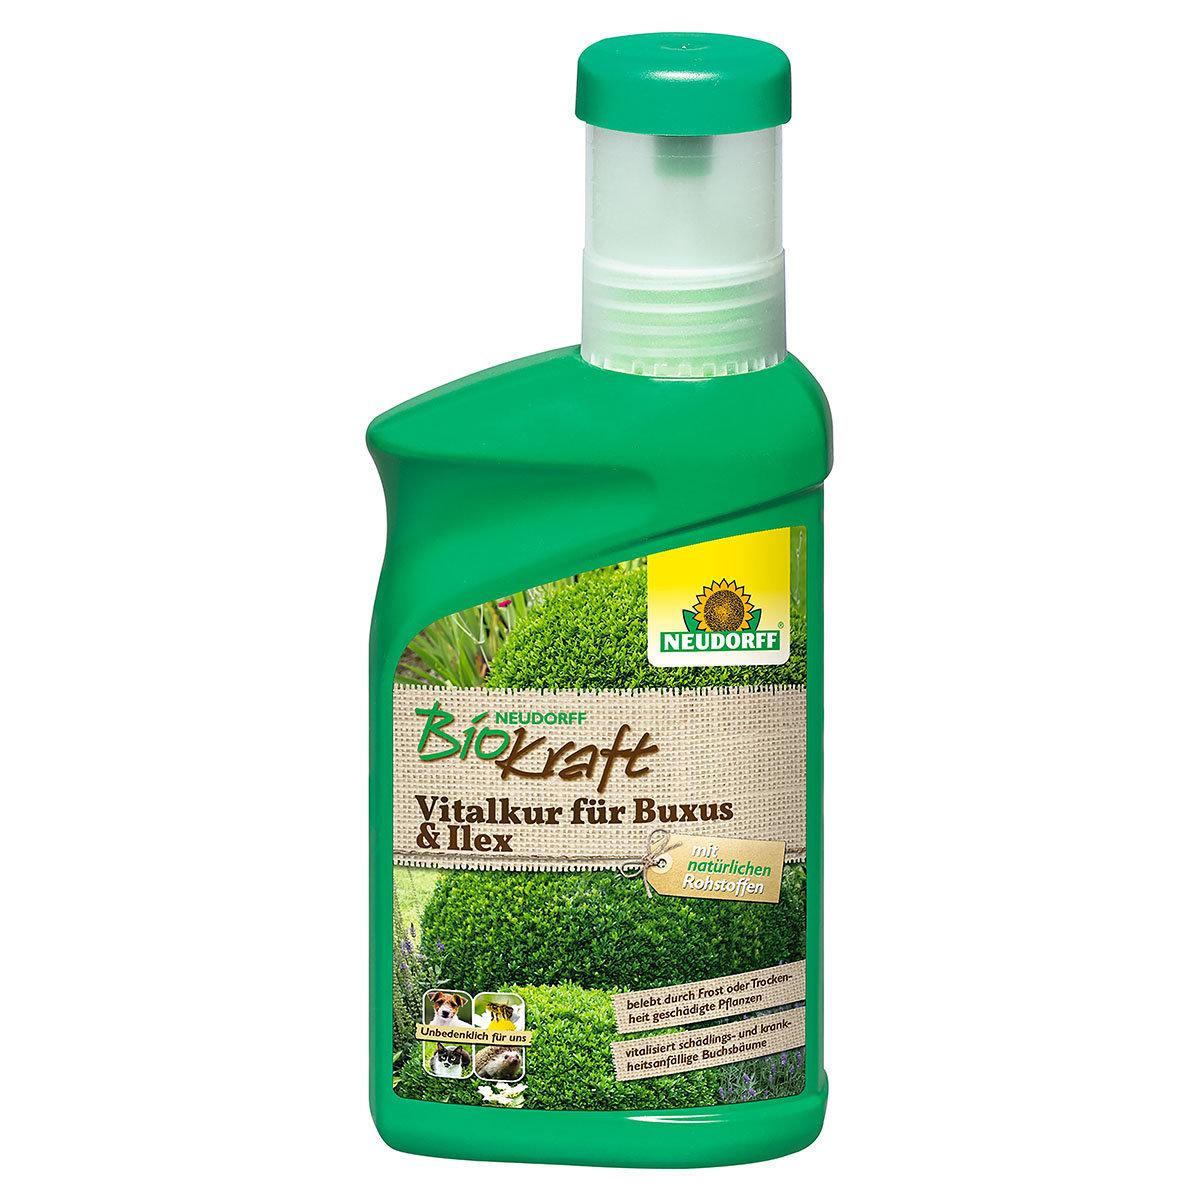 Neudorff BioKraft Vitalkur für Buxus & Ilex, 300 ml